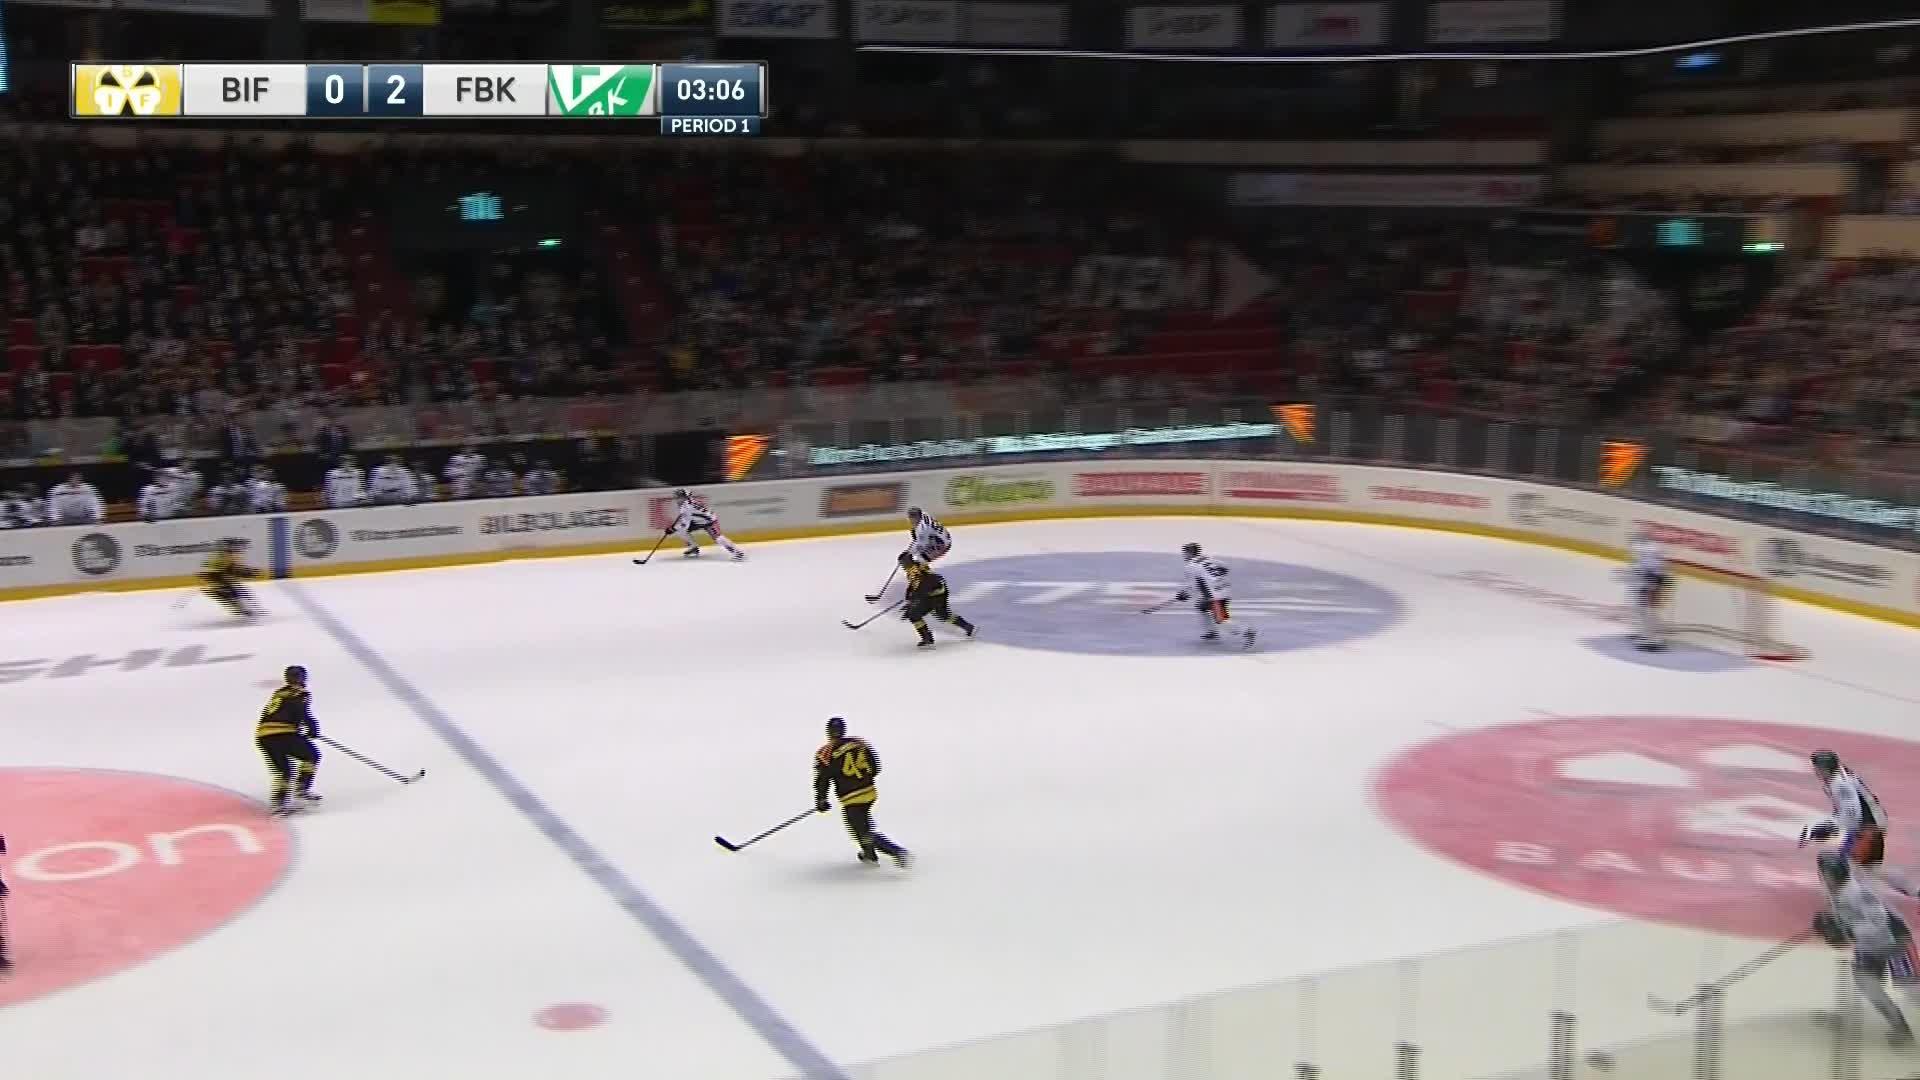 Brynäs IF - Färjestad BK 0-3